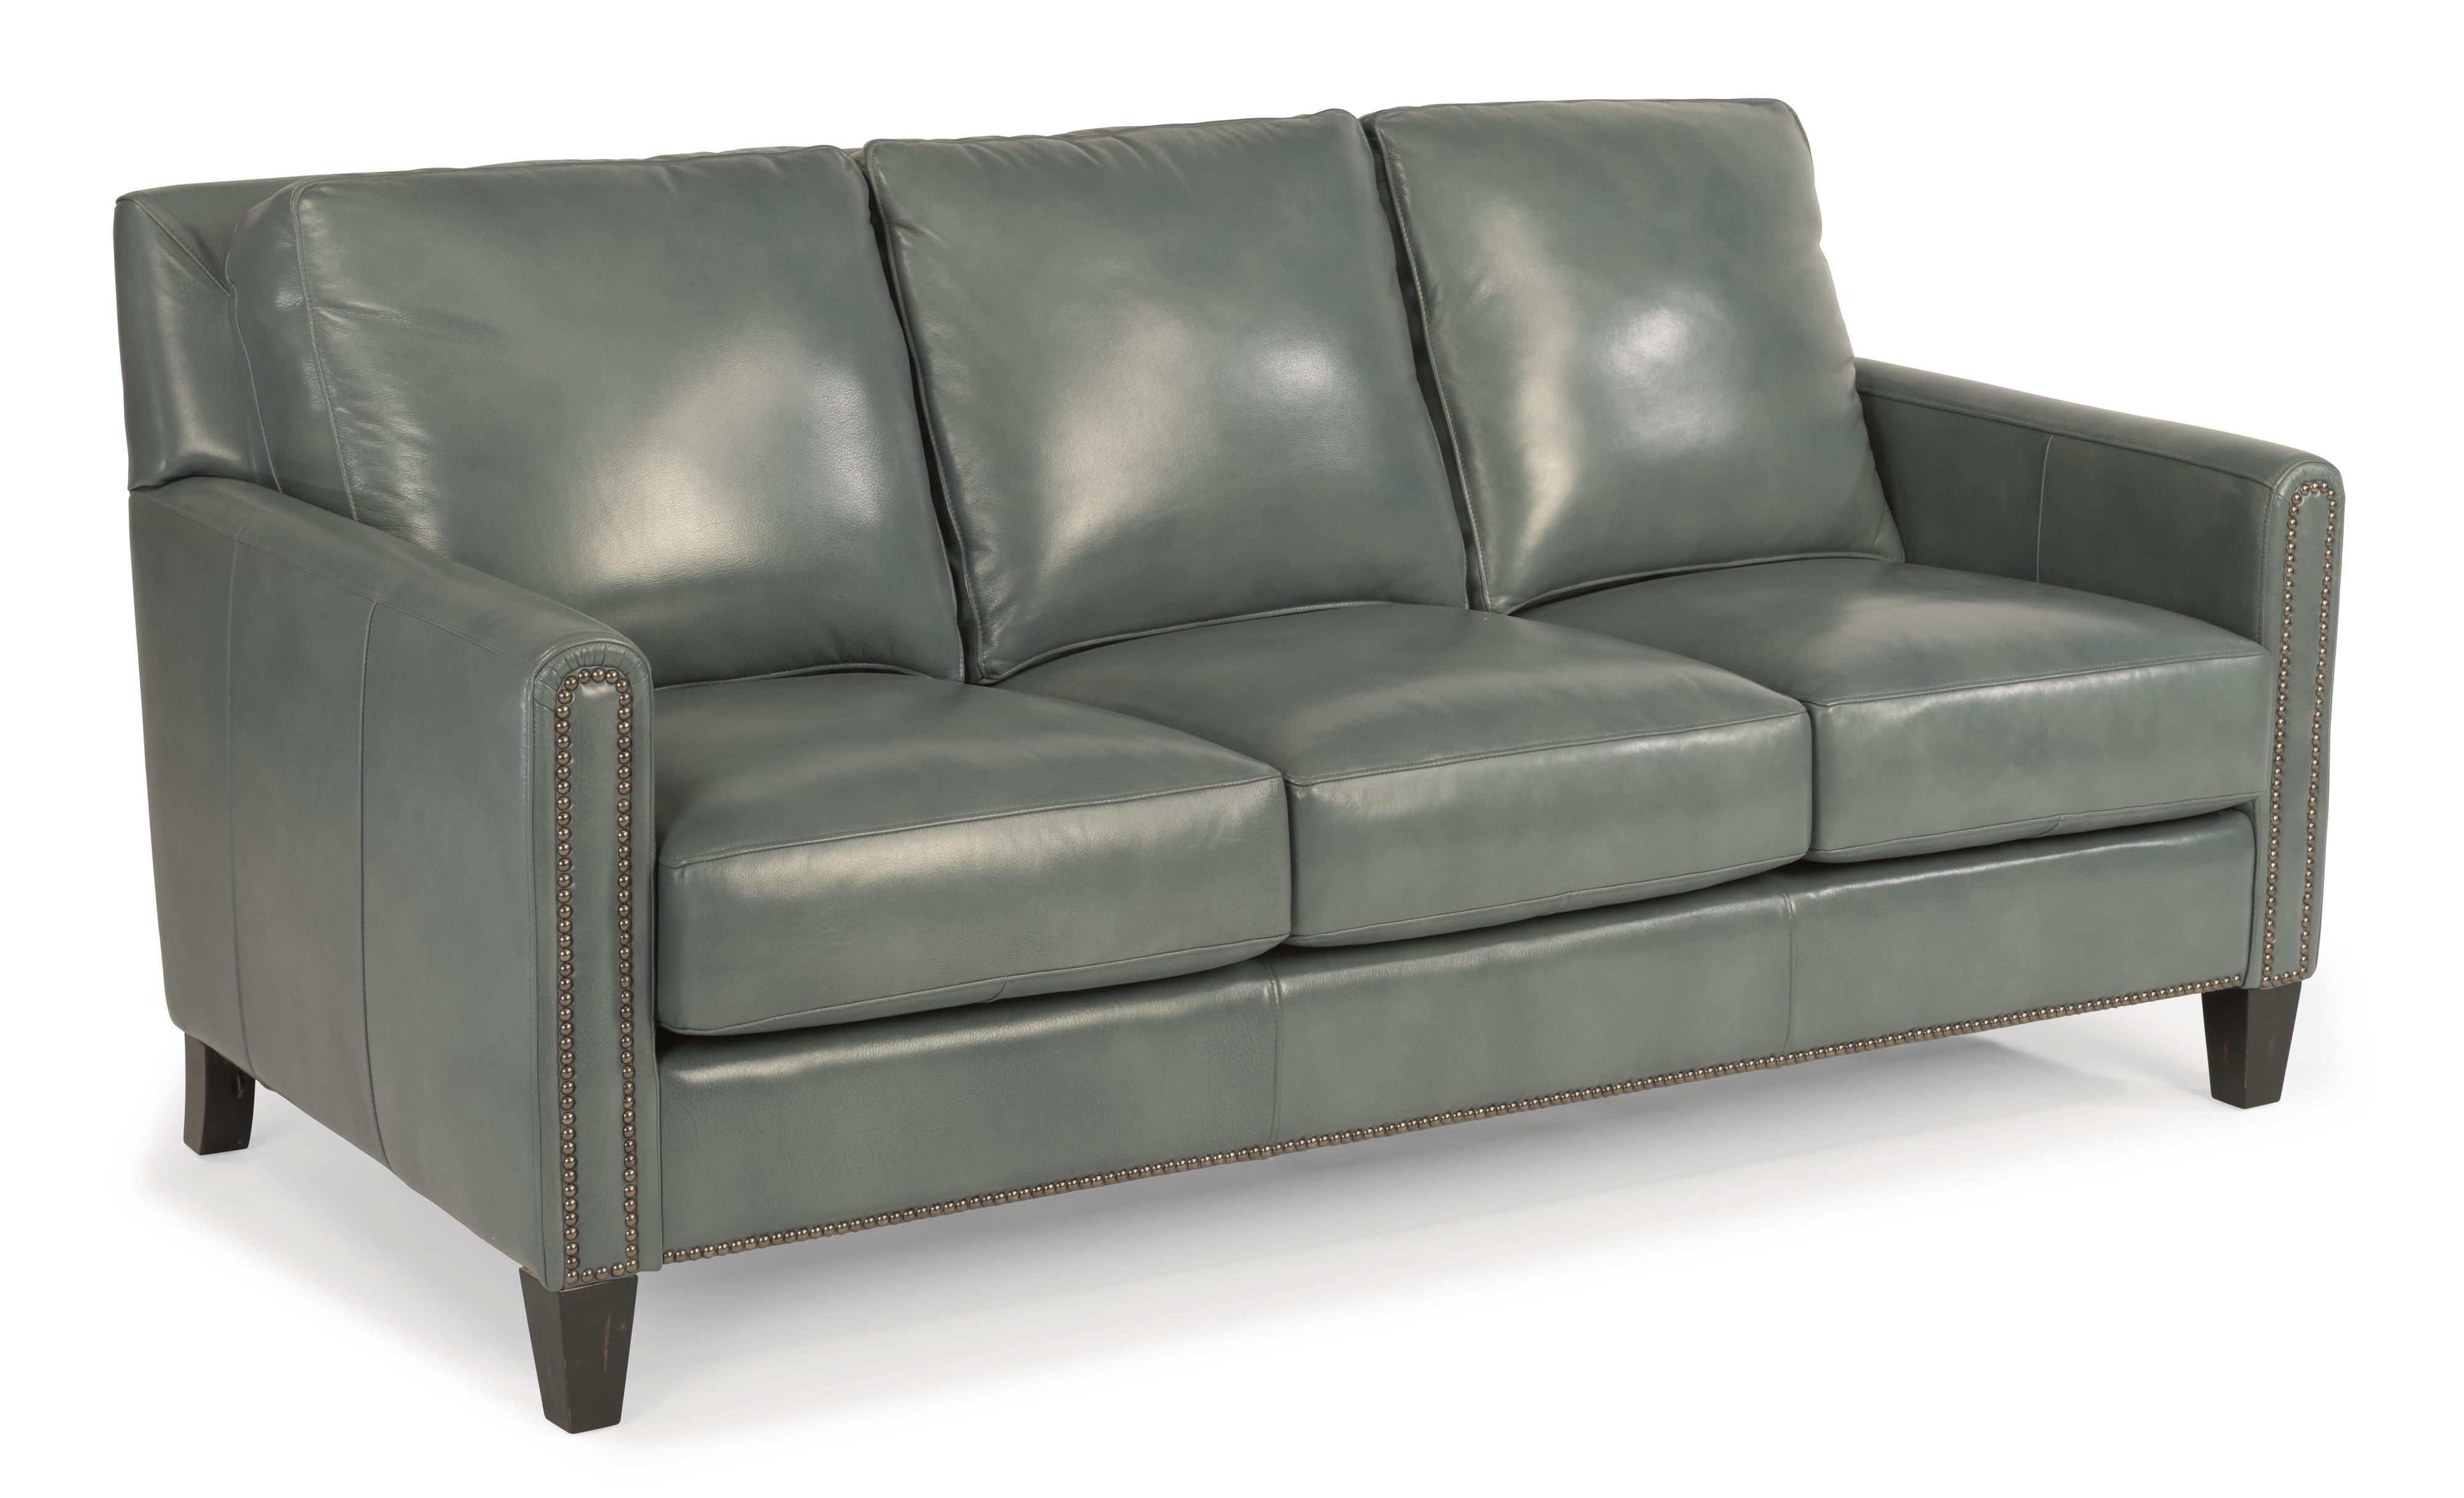 Flexsteel Latitudes-Reuben Sofa - Item Number: 1209-31-LSP-42